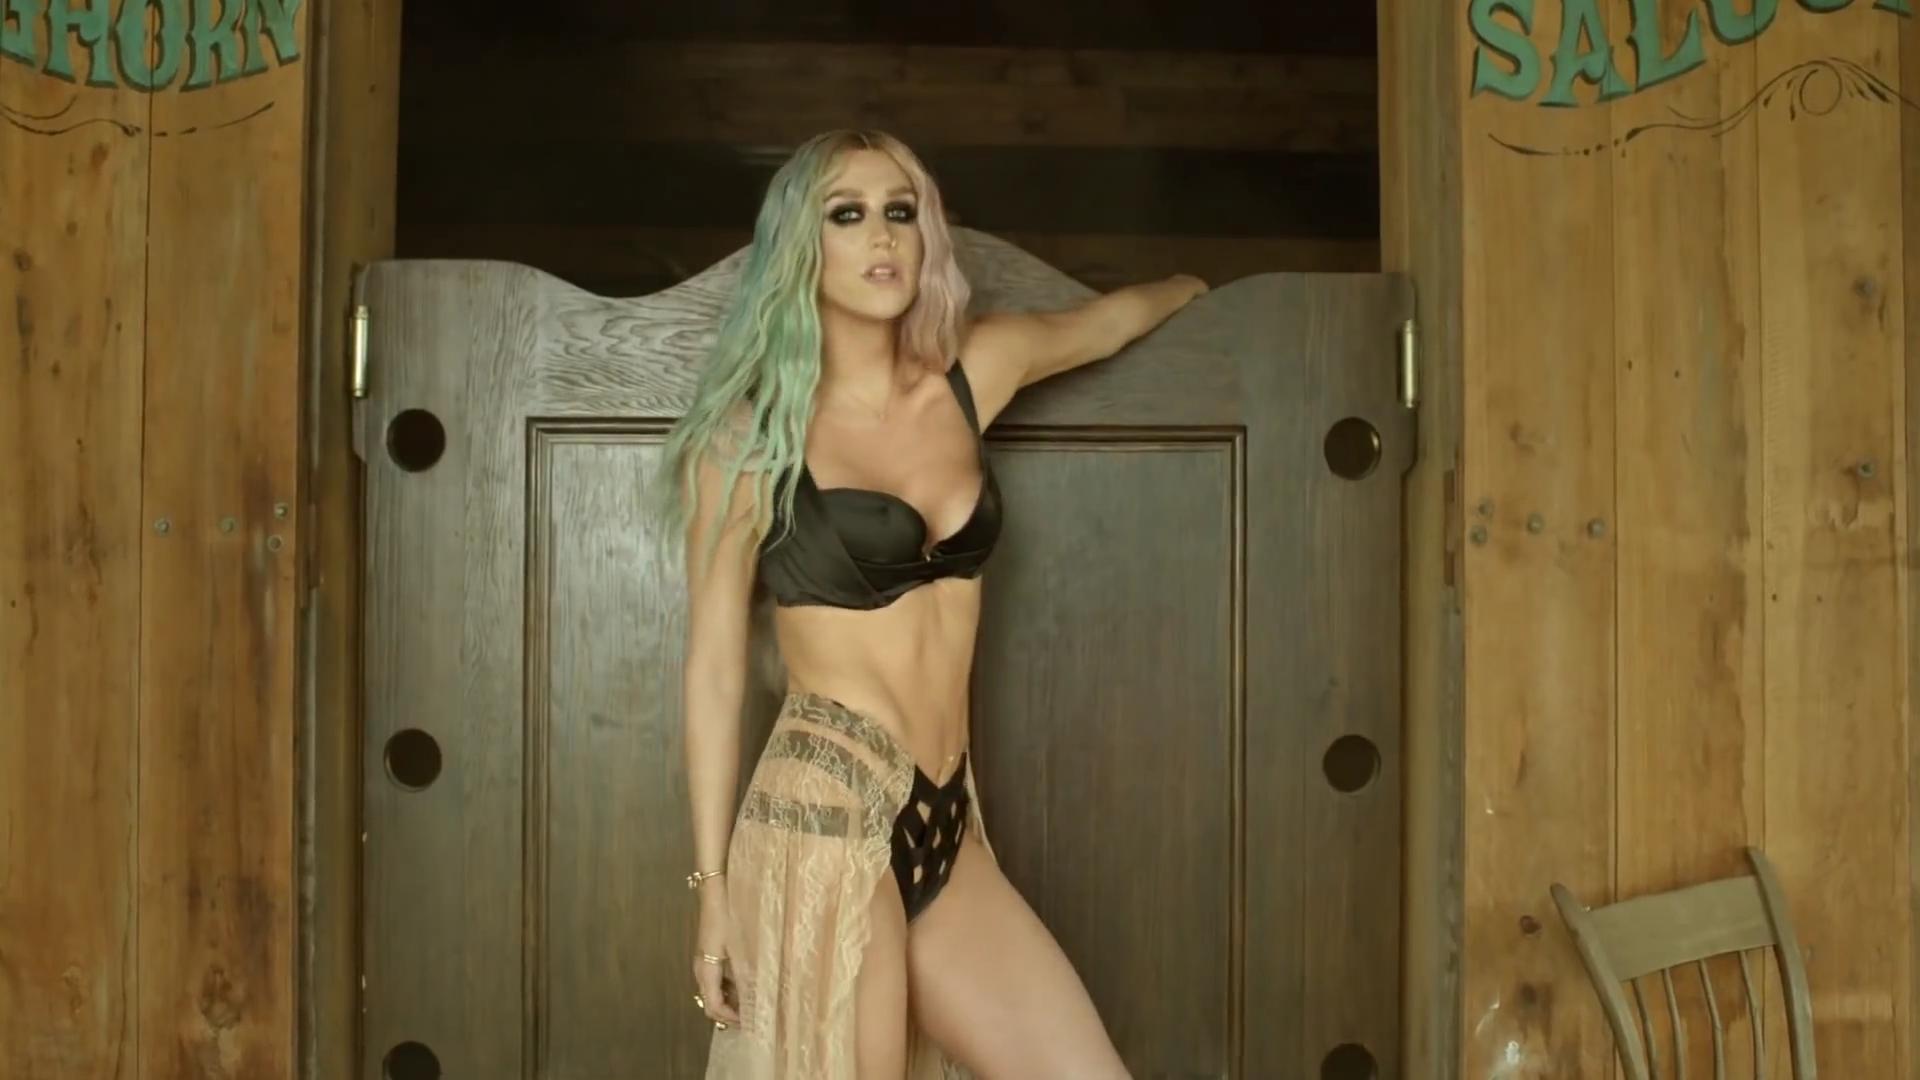 Клип Pitbull ft. Kesha – Timber смотреть онлайн